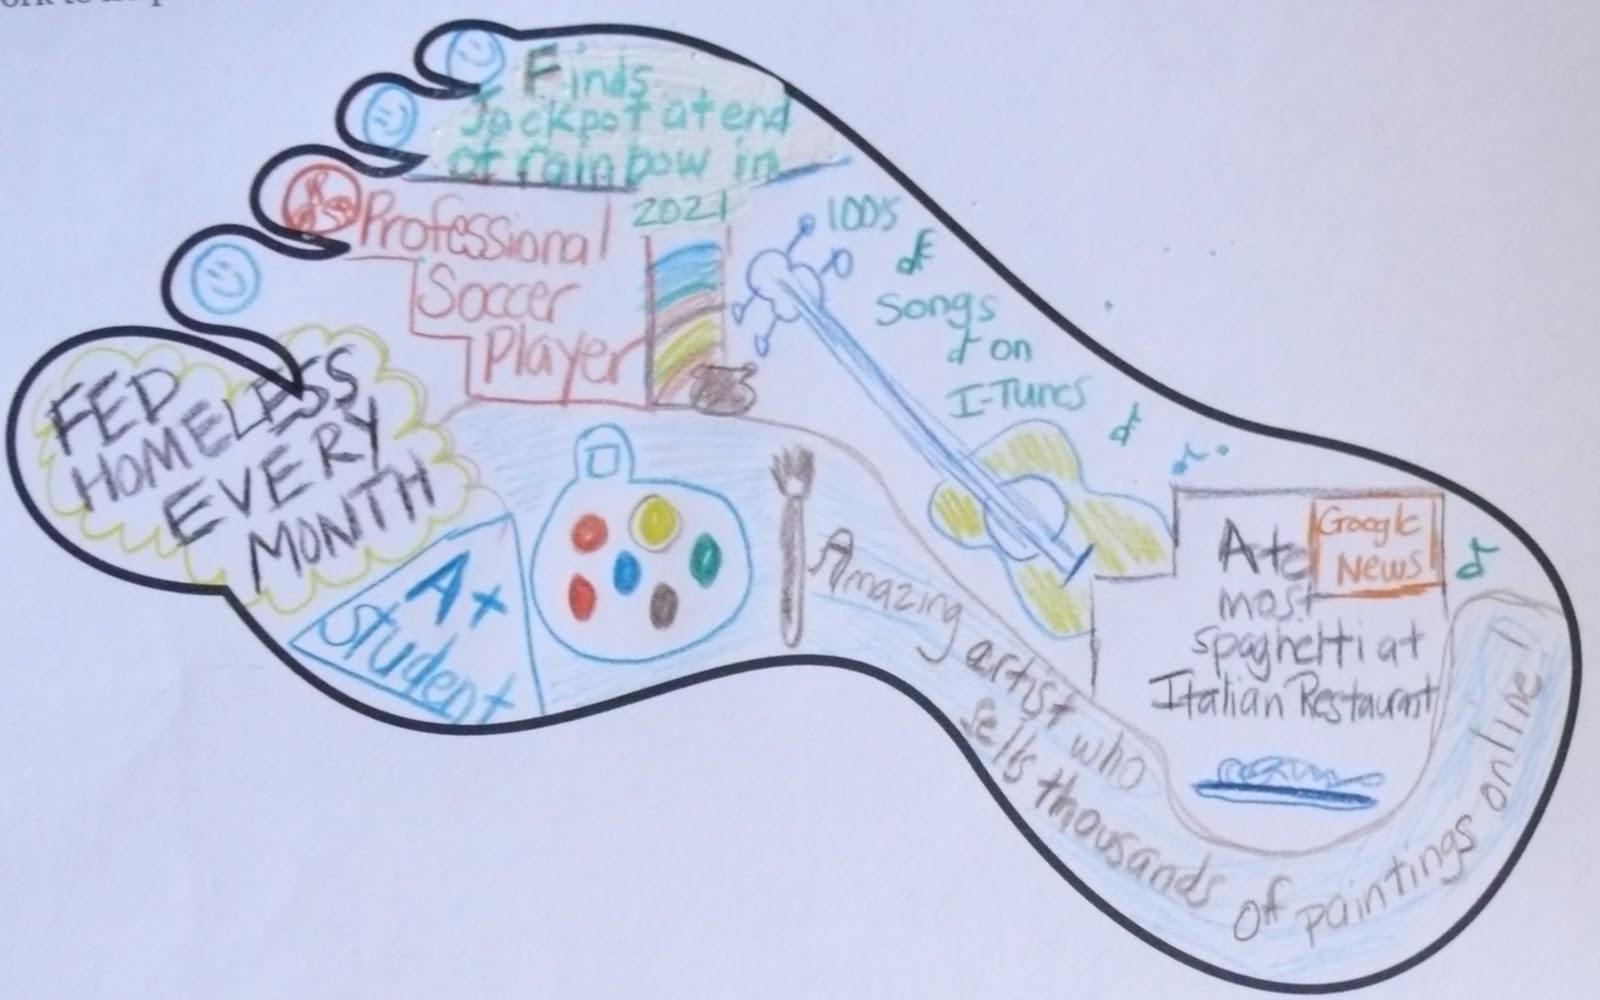 Cyber Civics Blog Imagining Digital Footprints In